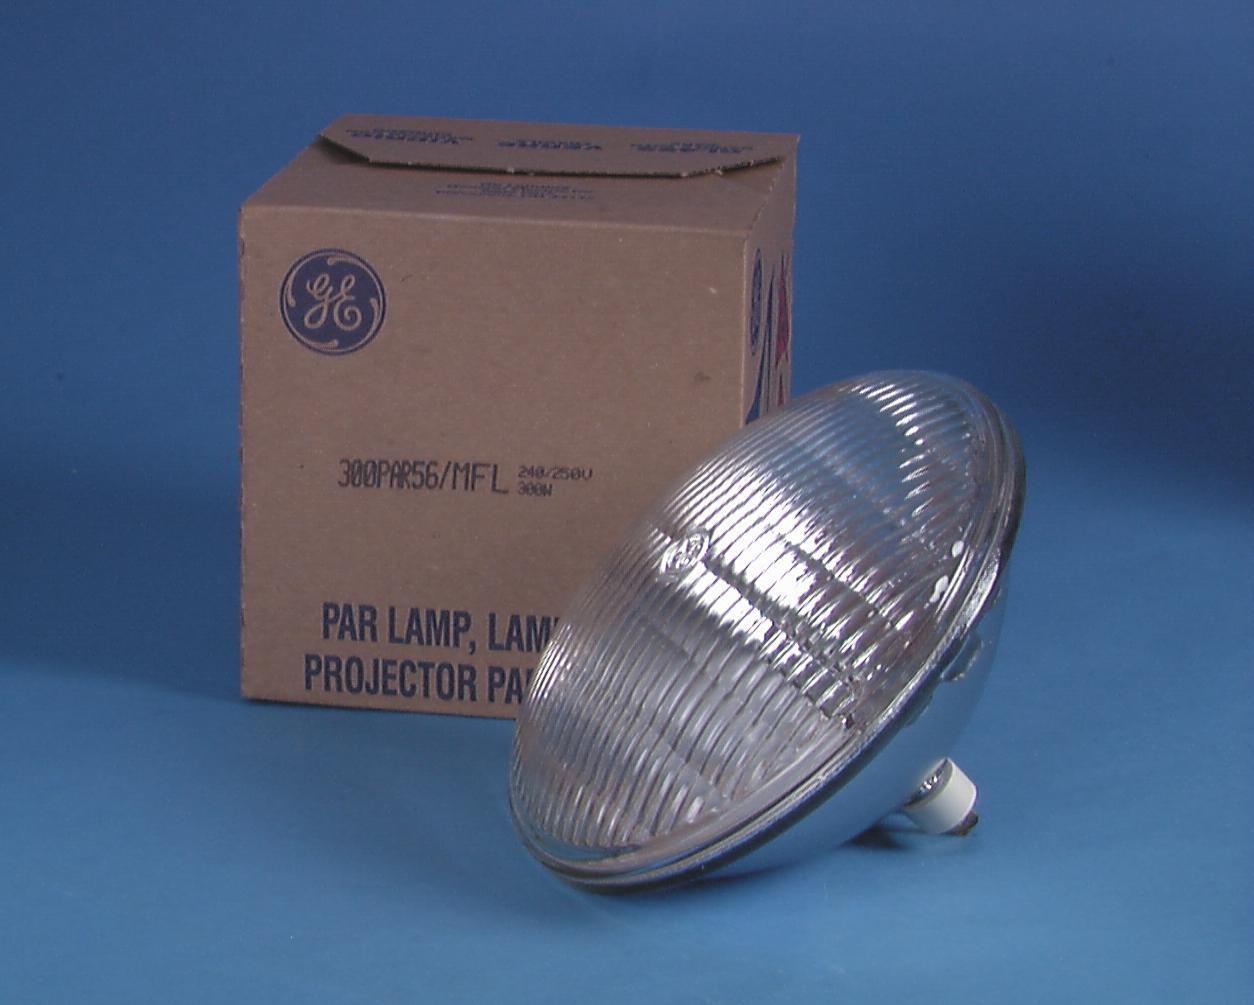 Lamp Headlight for PAR-56 GE PAR-56 240V/300W WFL GX16d 2000h 2750 K